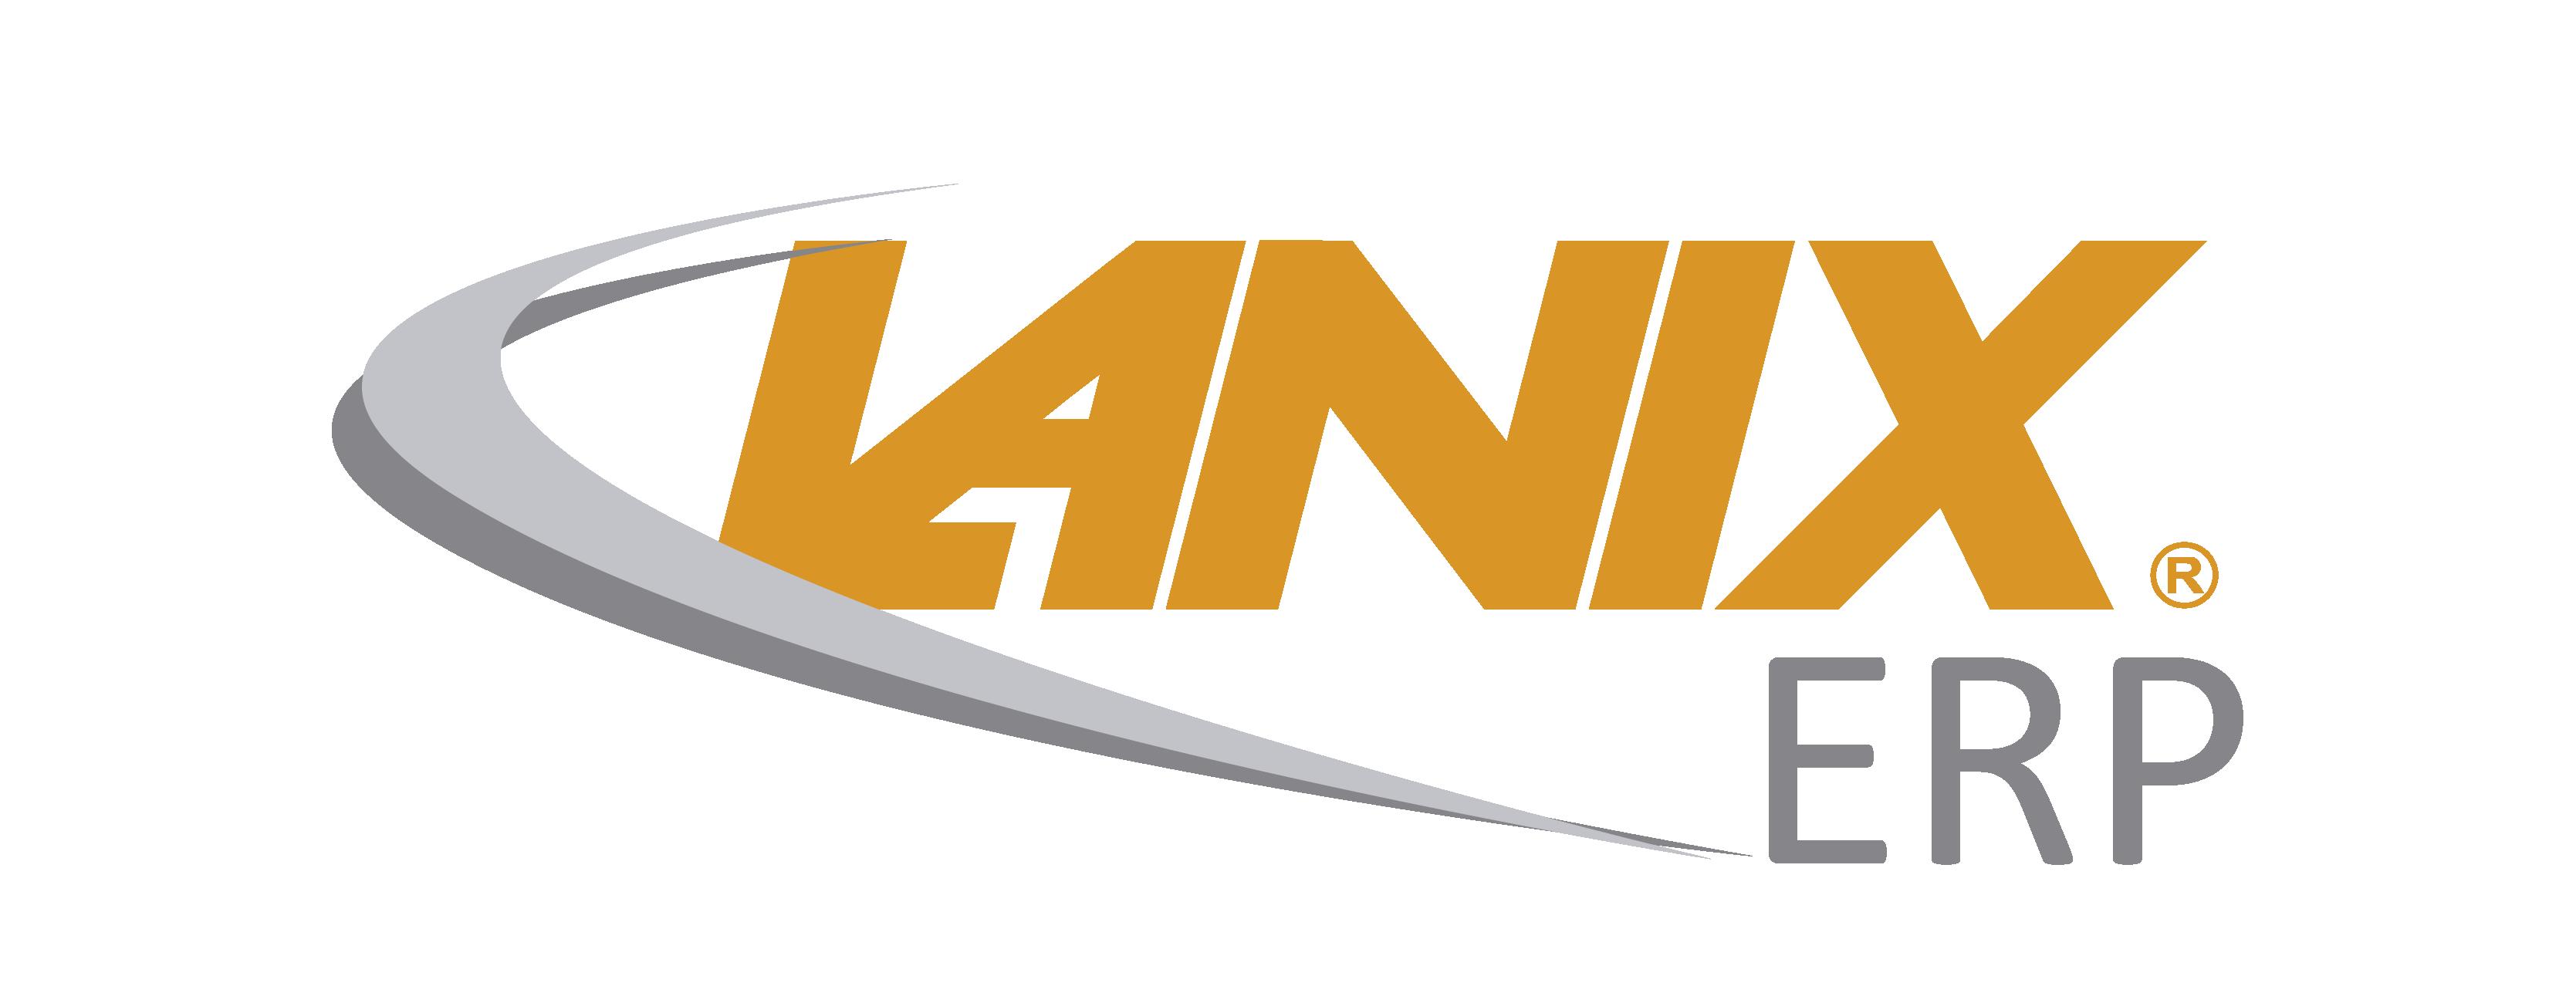 Lanix ERP